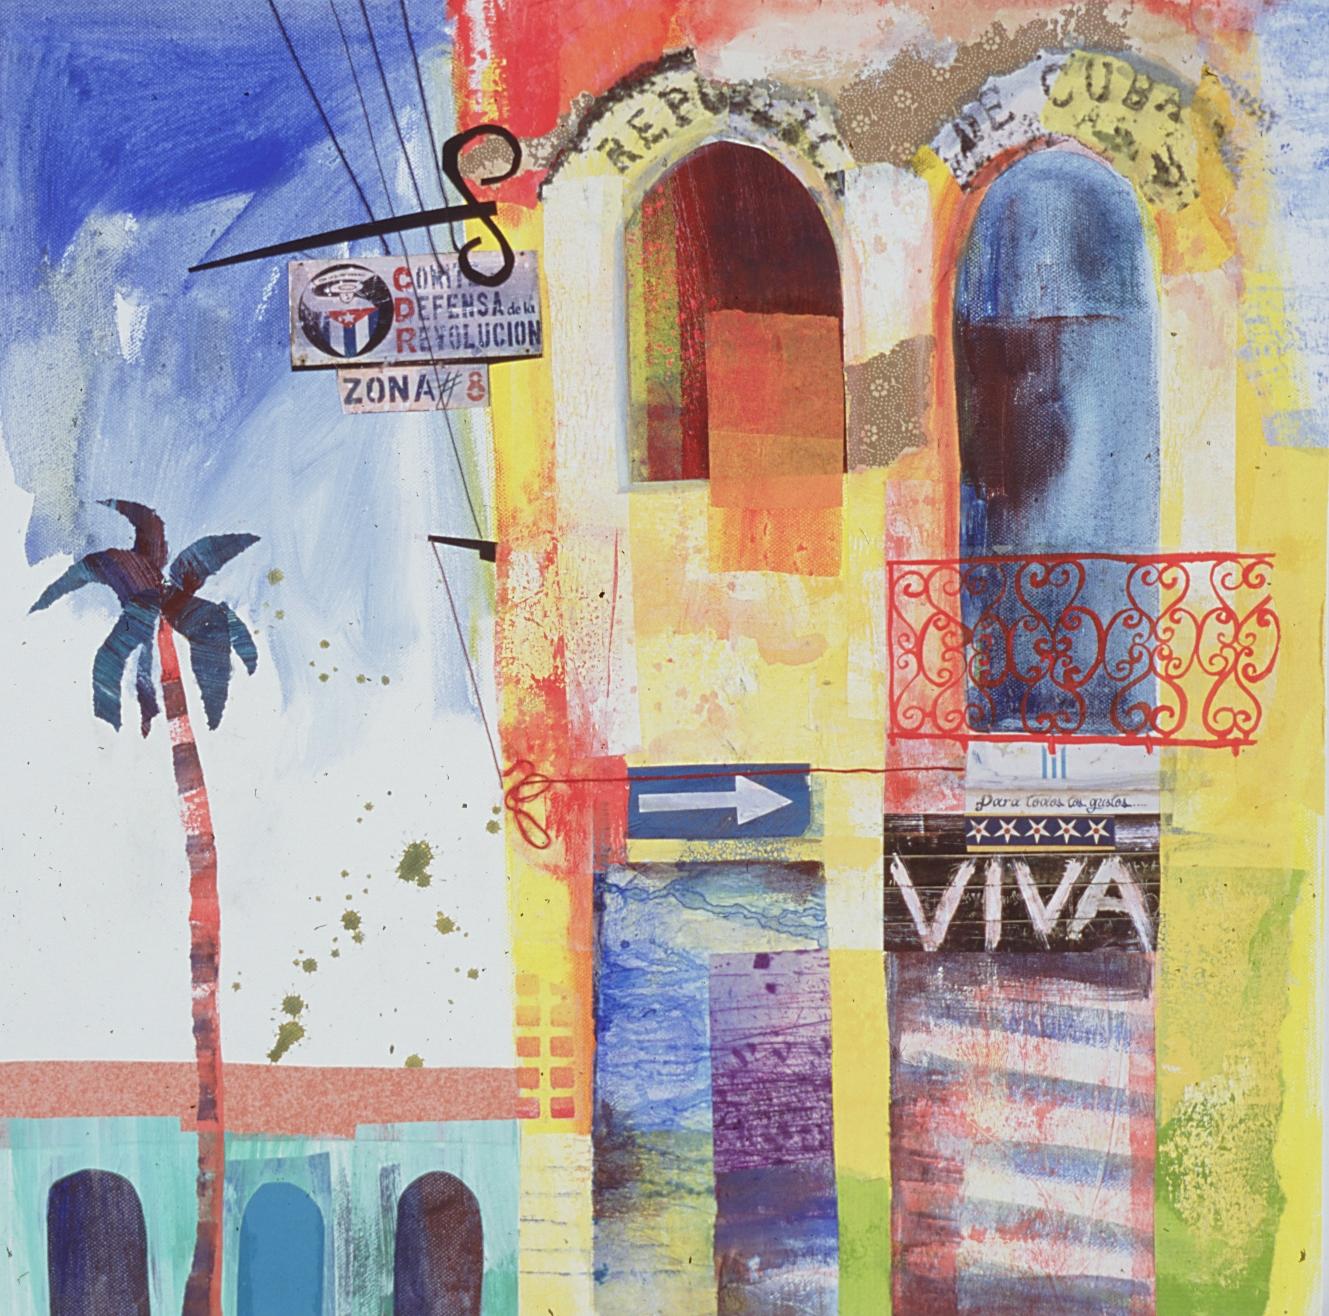 Viva la france - 1 3